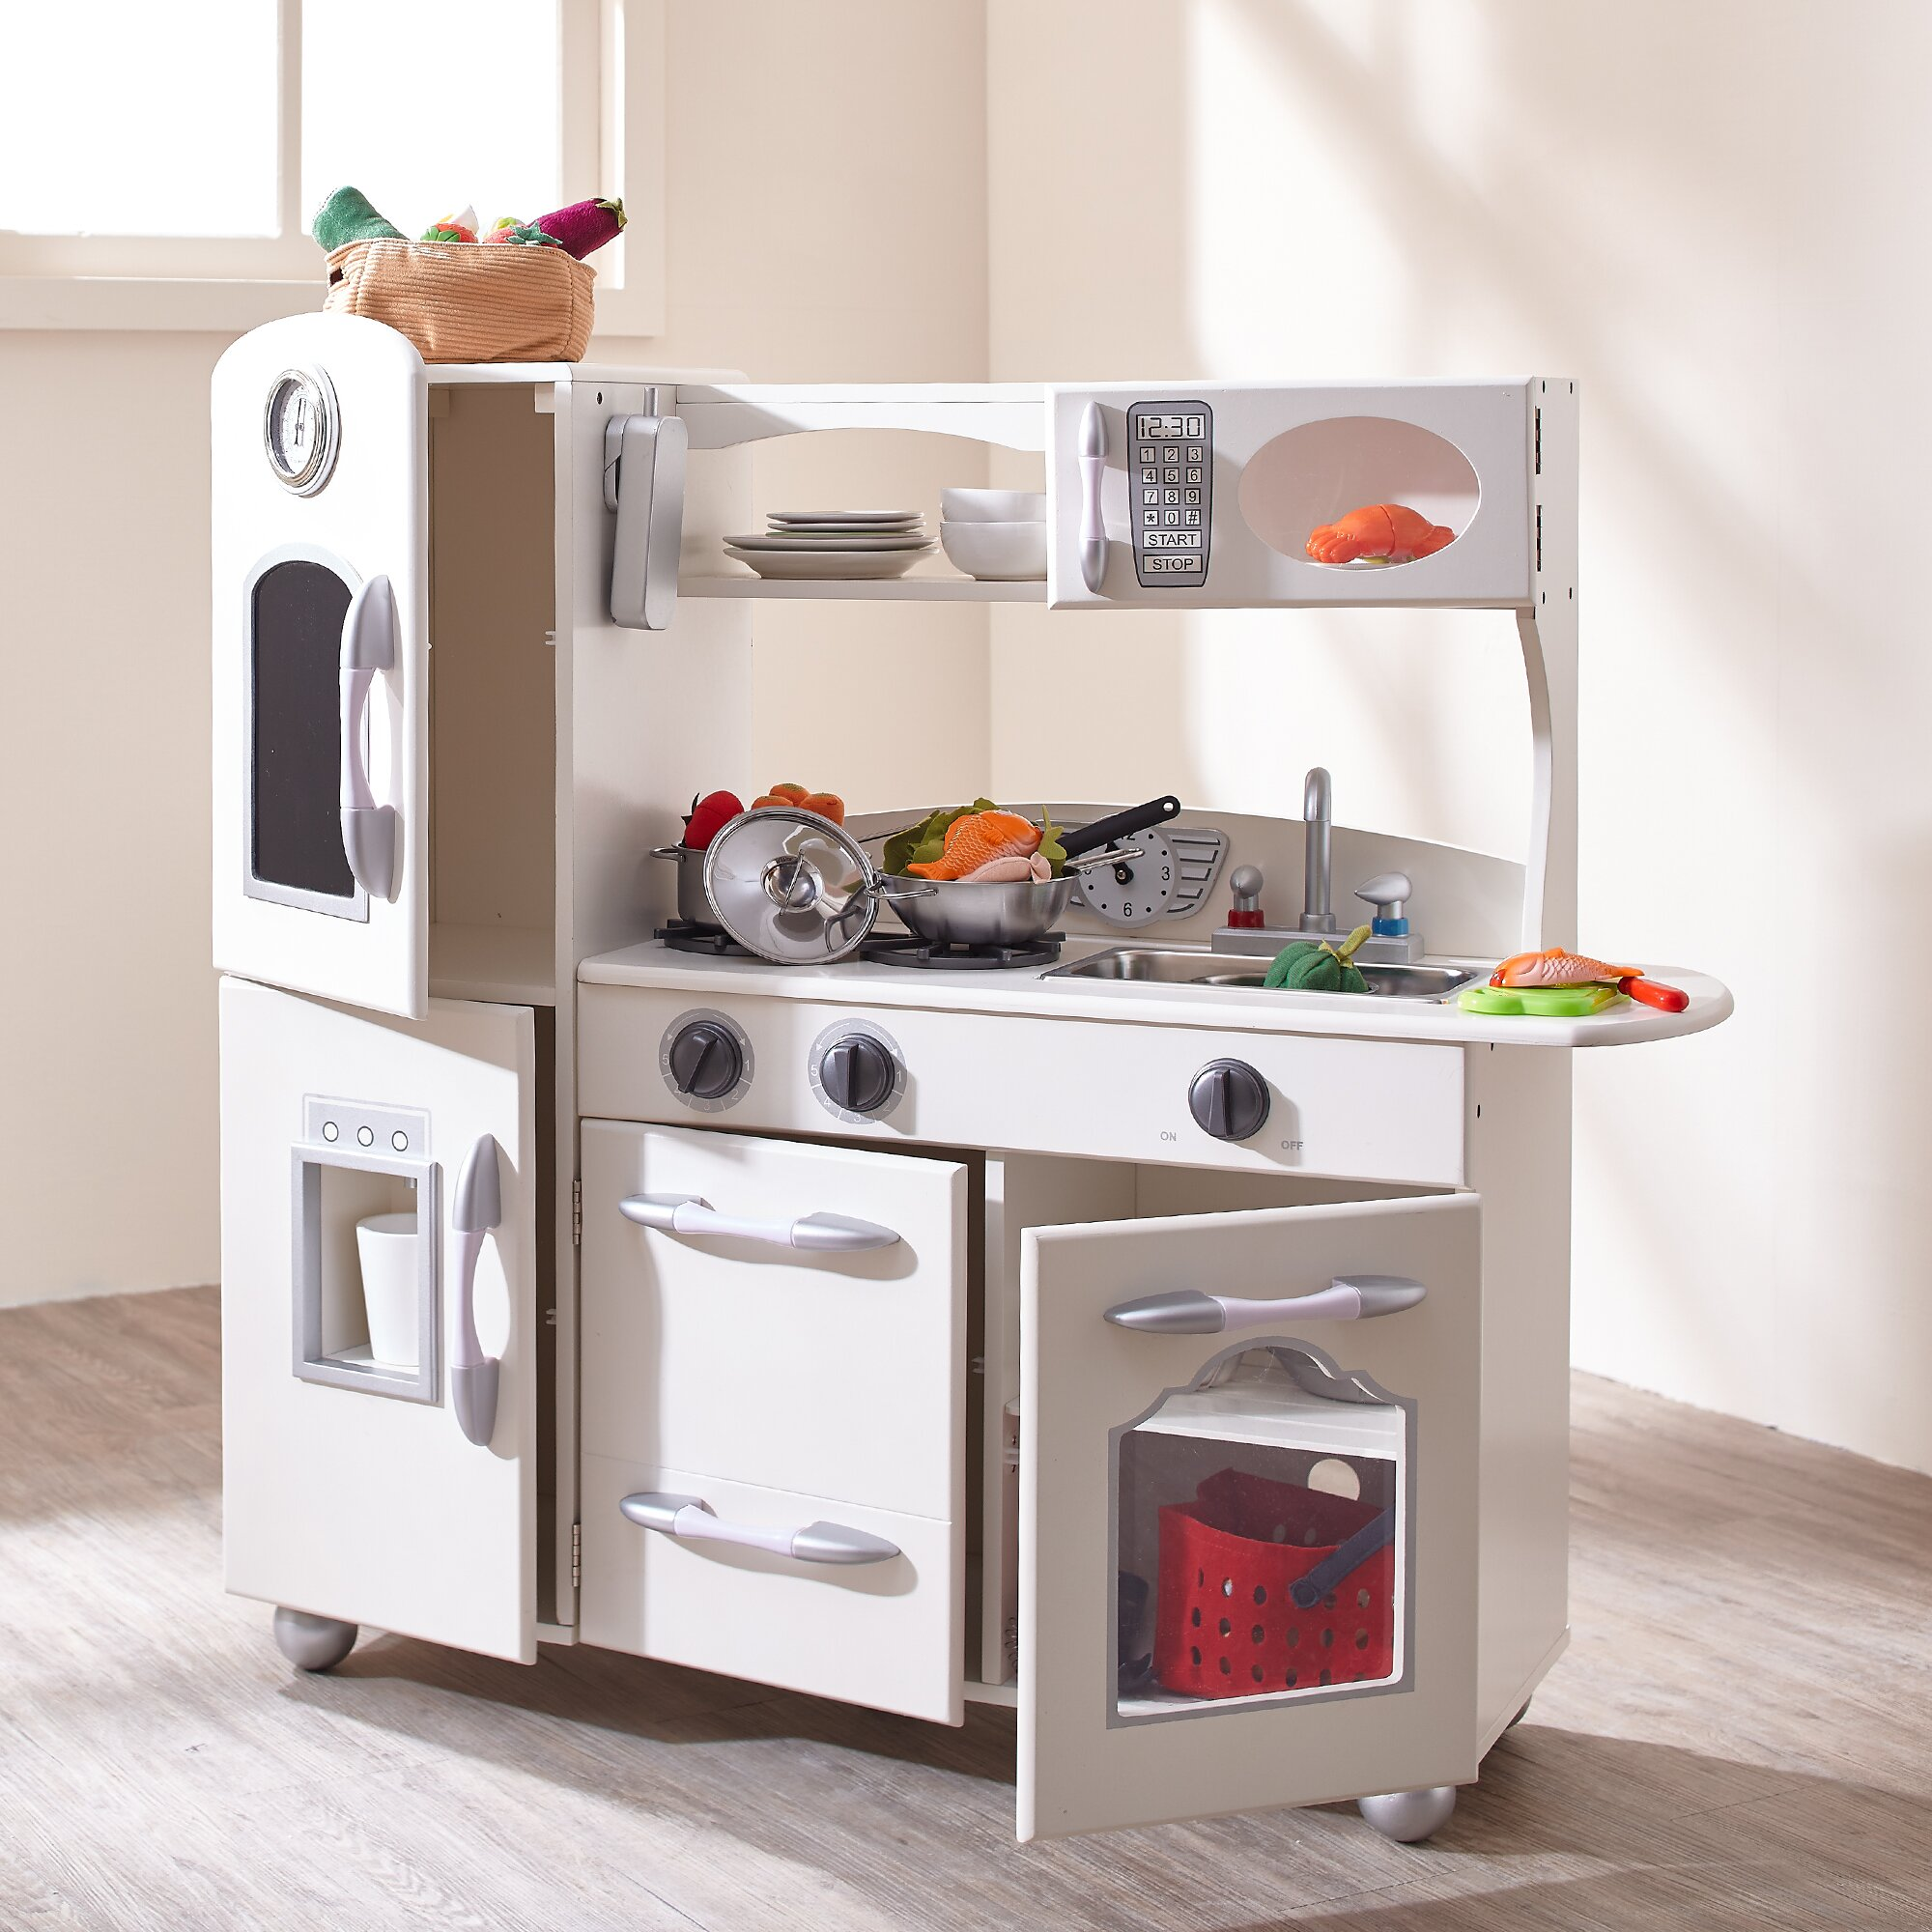 Childrens Kitchens: Teamson Kids Wooden Play Kitchen Set & Reviews